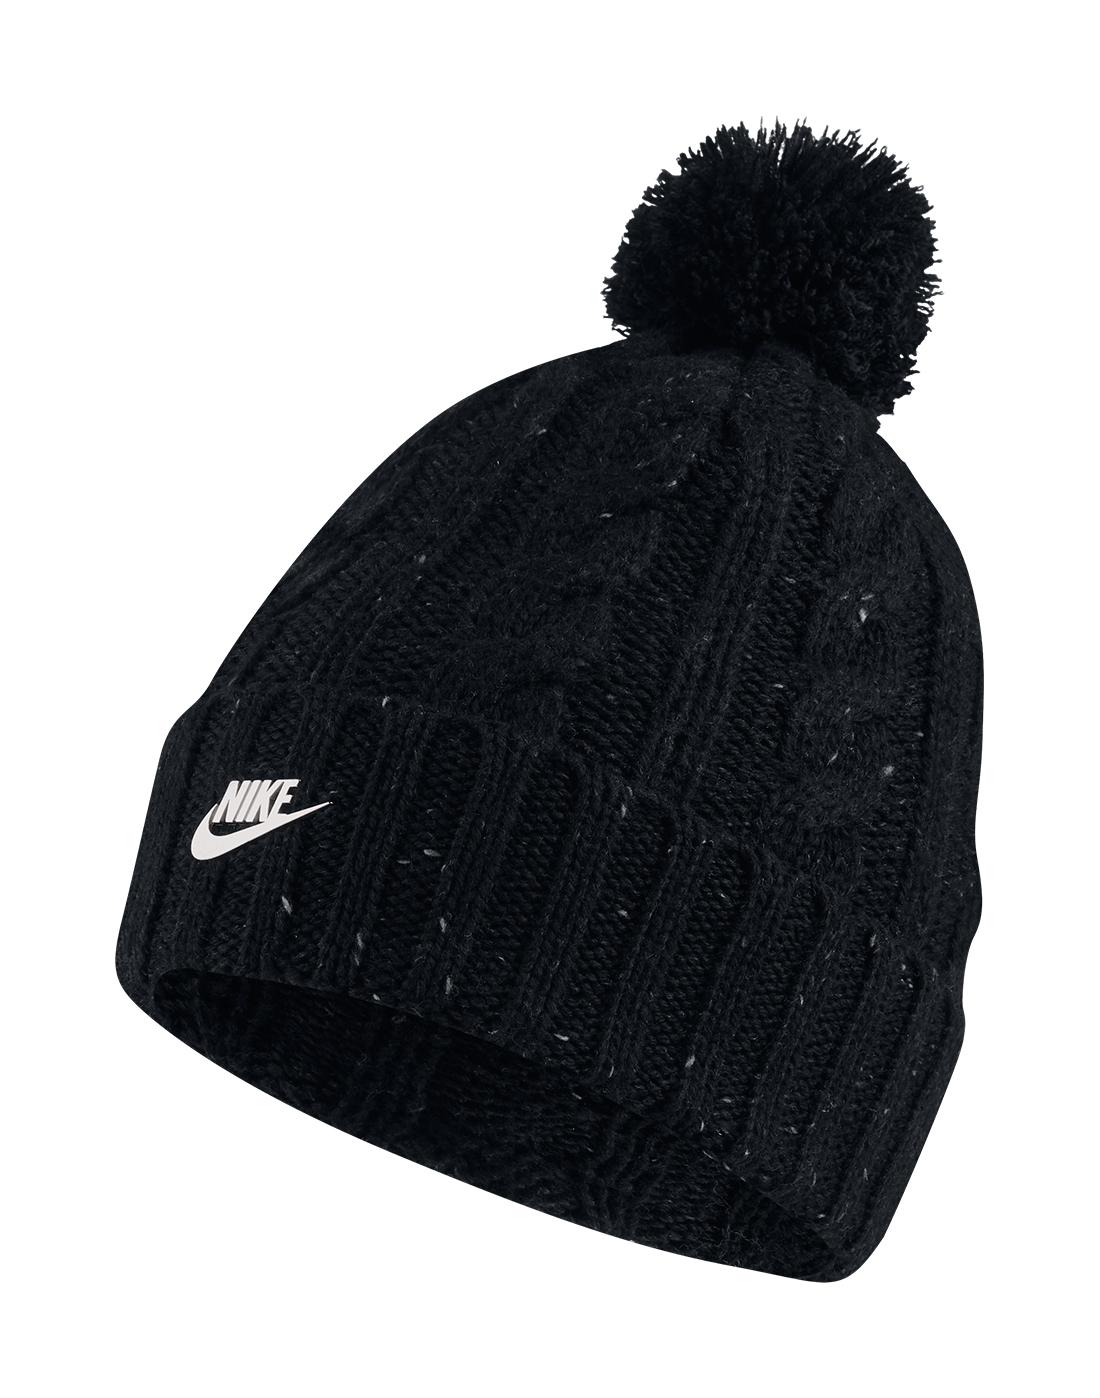 Nike Cable Knit Bobble Beanie  26234da43ea